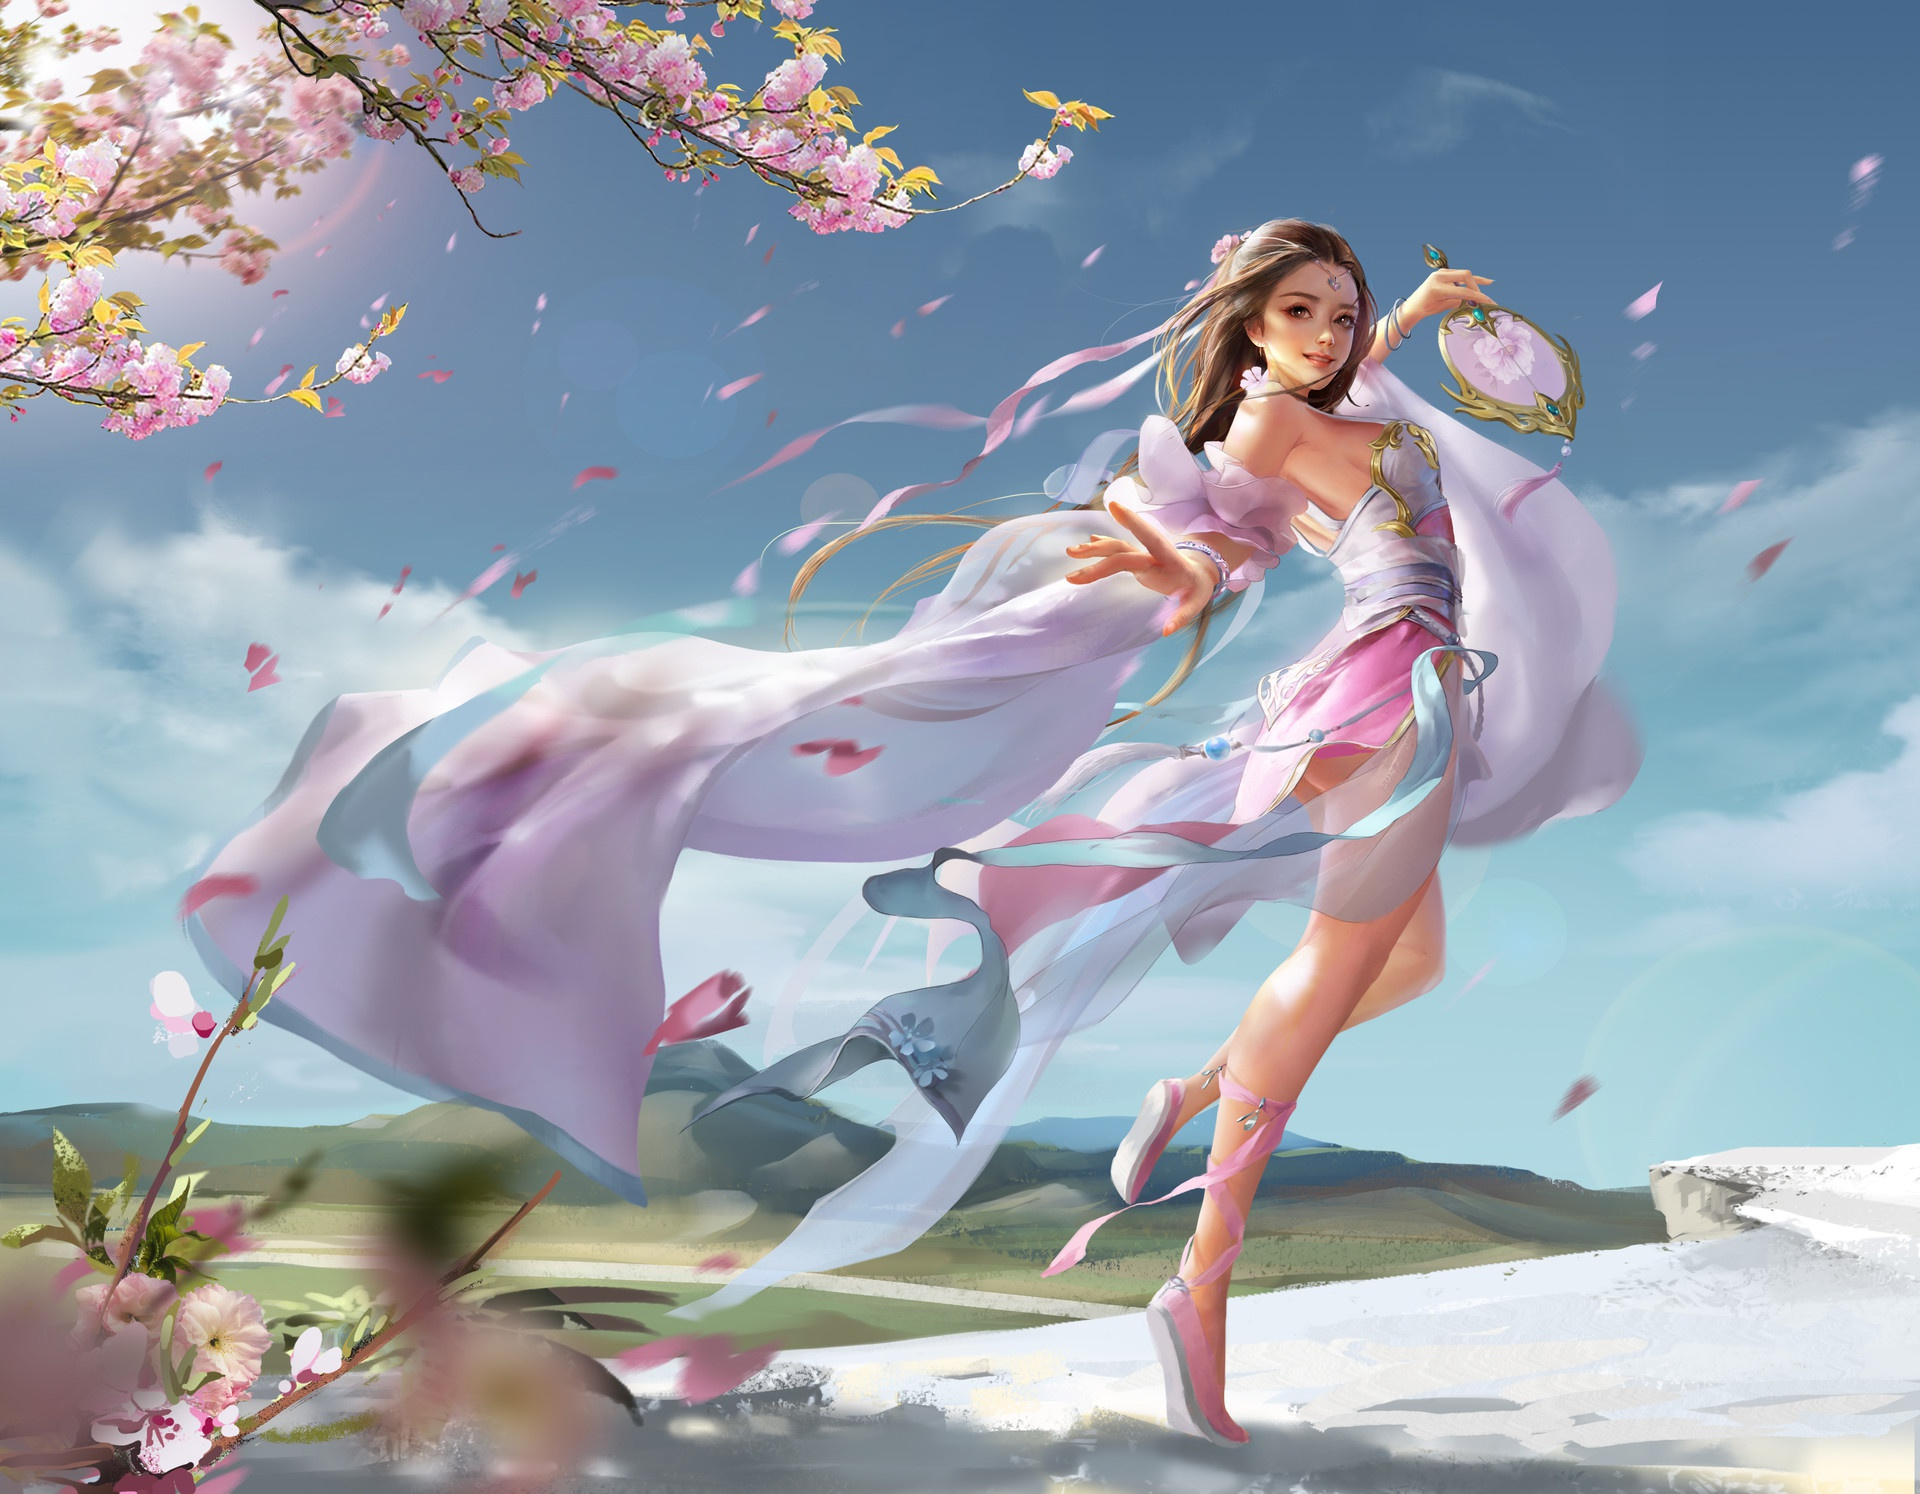 Танец с цветами картинки, или